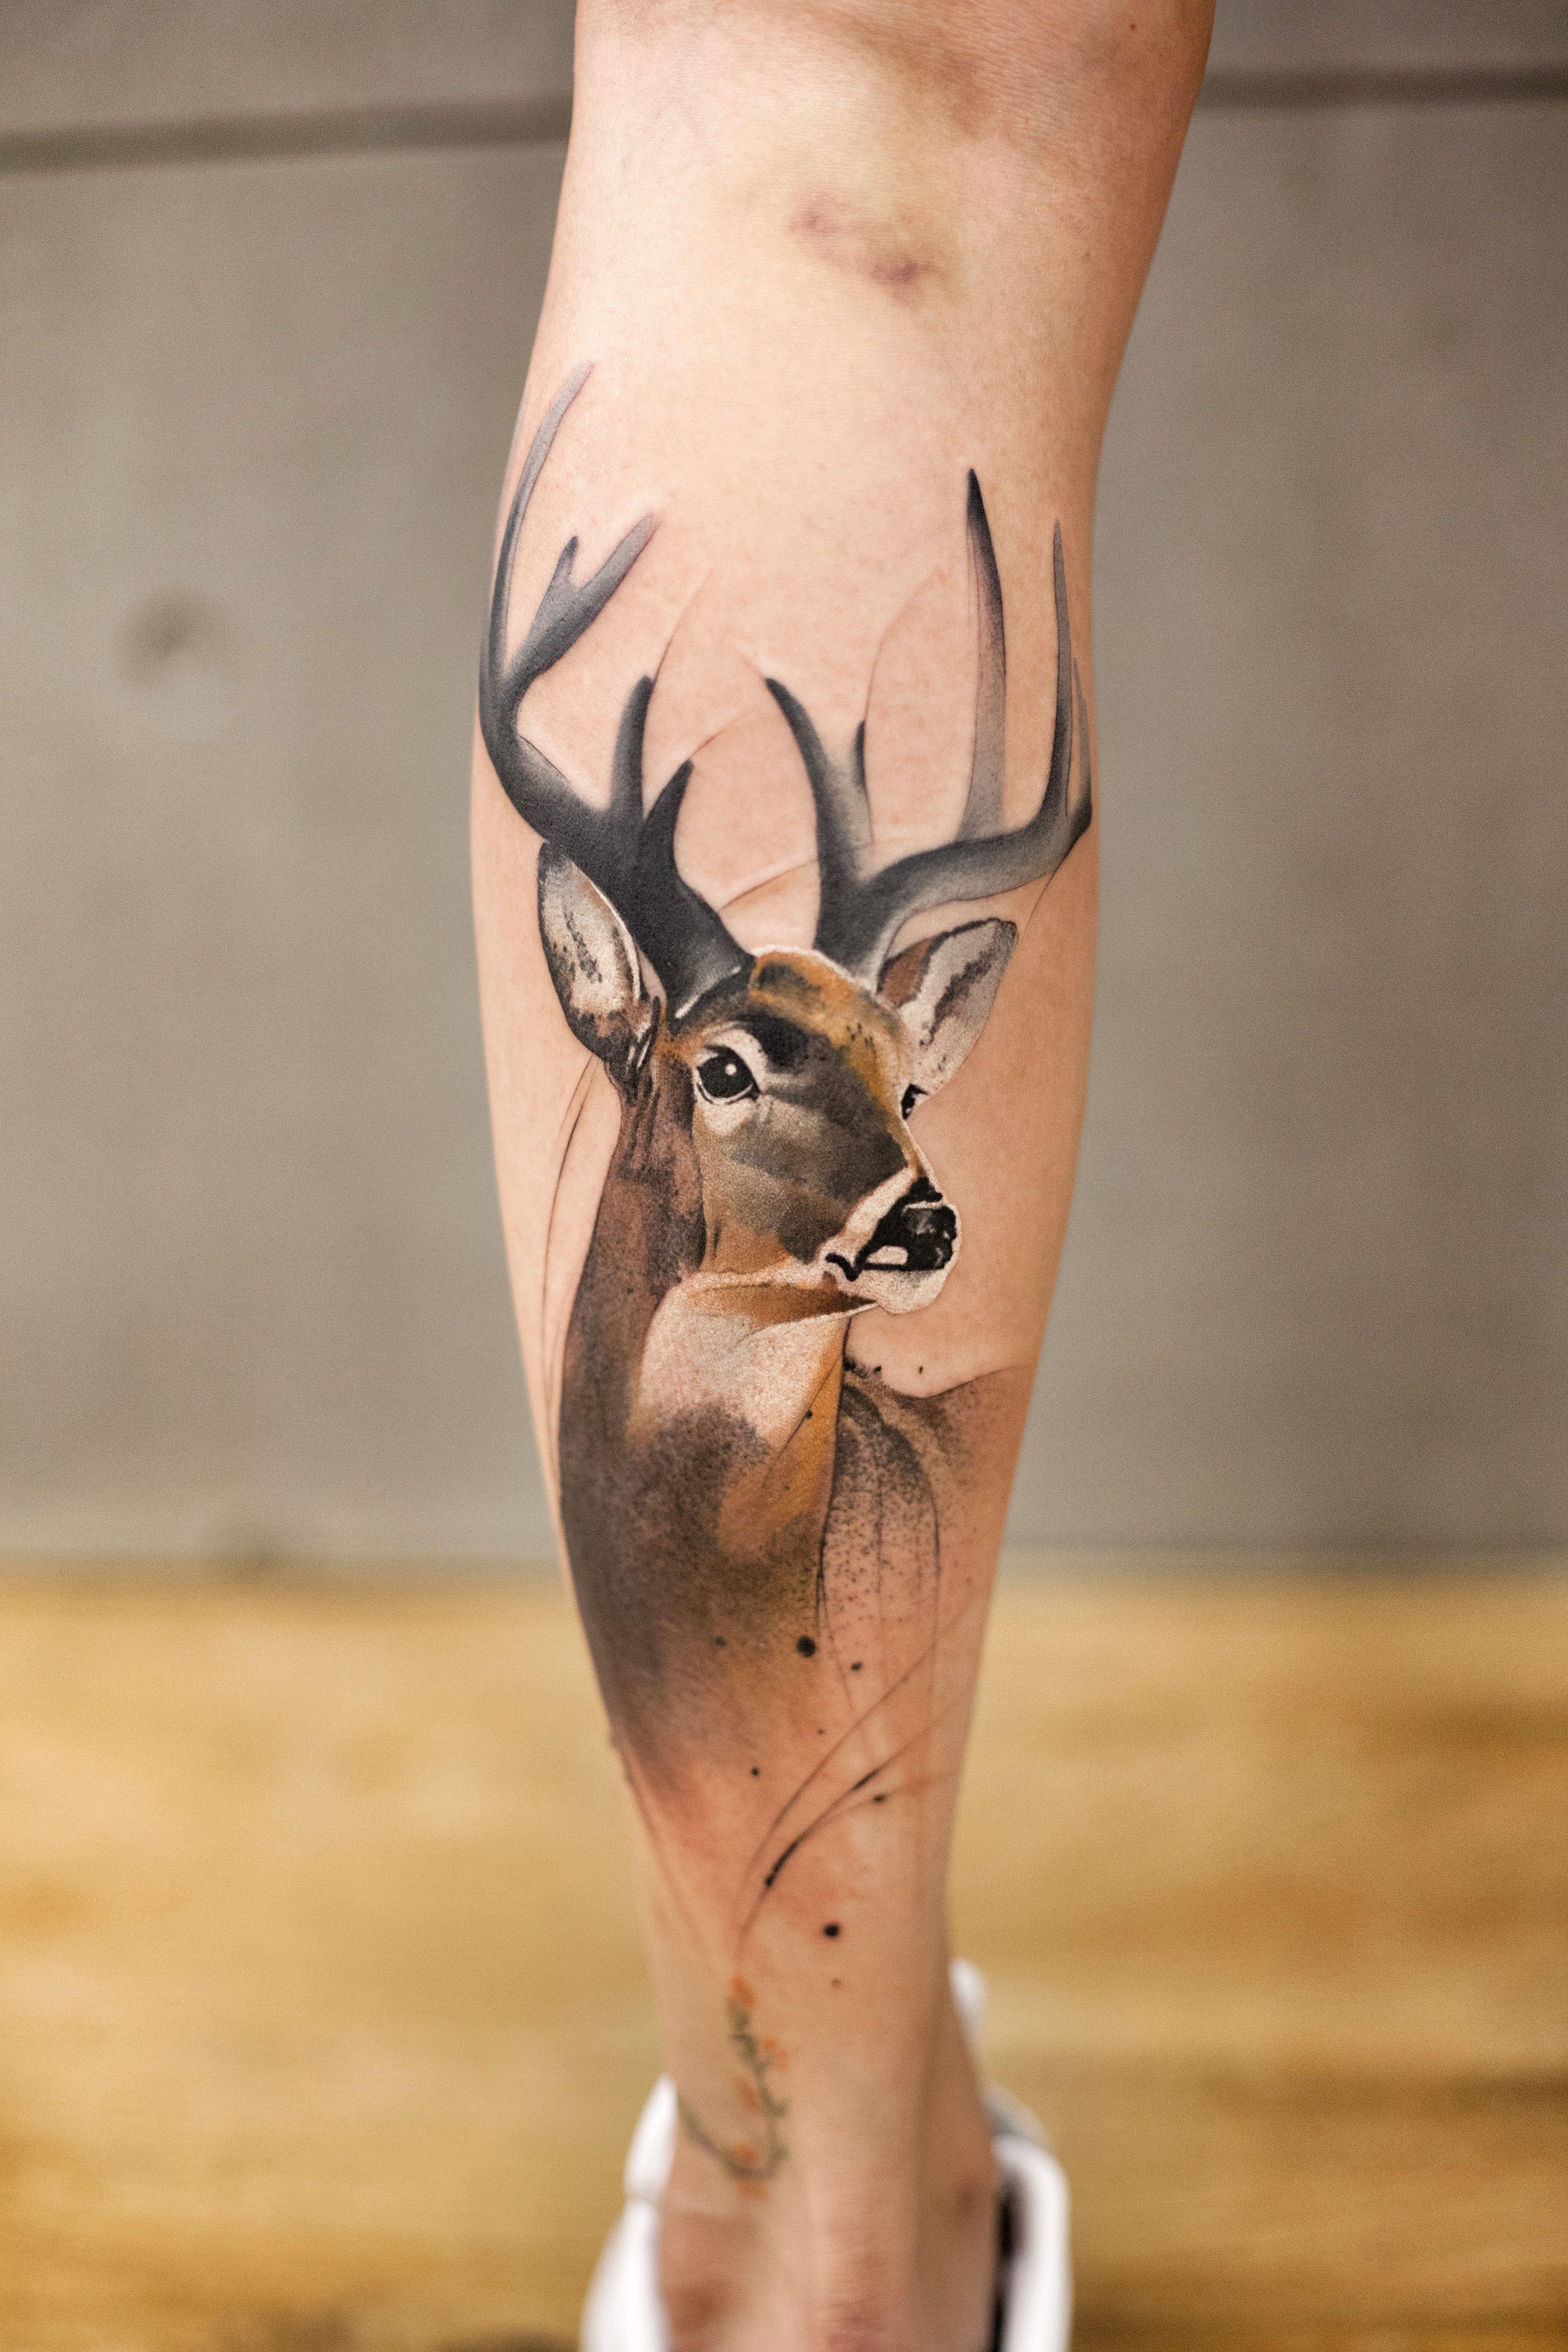 Easy Hunting Tattoos : hunting, tattoos, Tattoos, #chinese, #beijjng, Instagram:chenjie.newtattoo, #deertattoo, Hunting, Tattoos,, Tattoo,, Tattoo